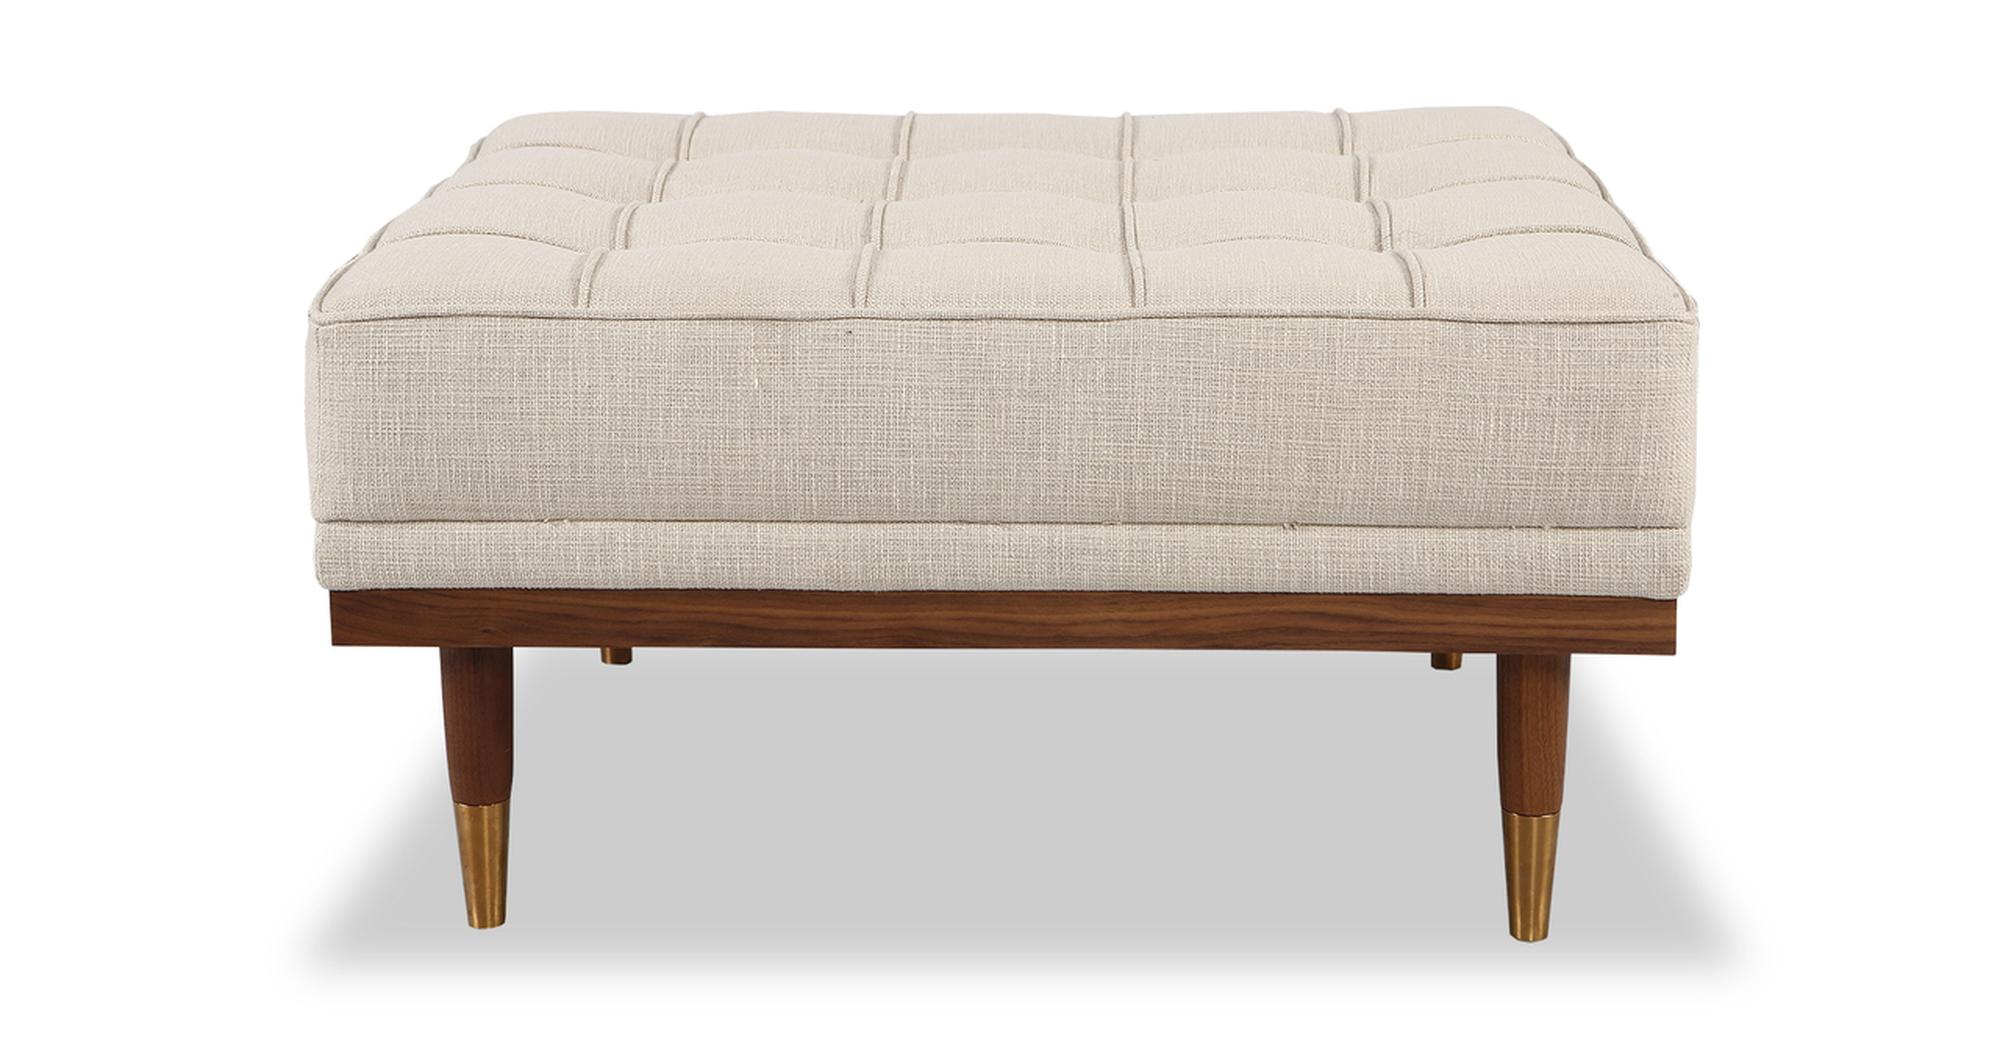 "Woodrow 33"" Box Fabric Ottoman, Walnut/Urban Hemp"